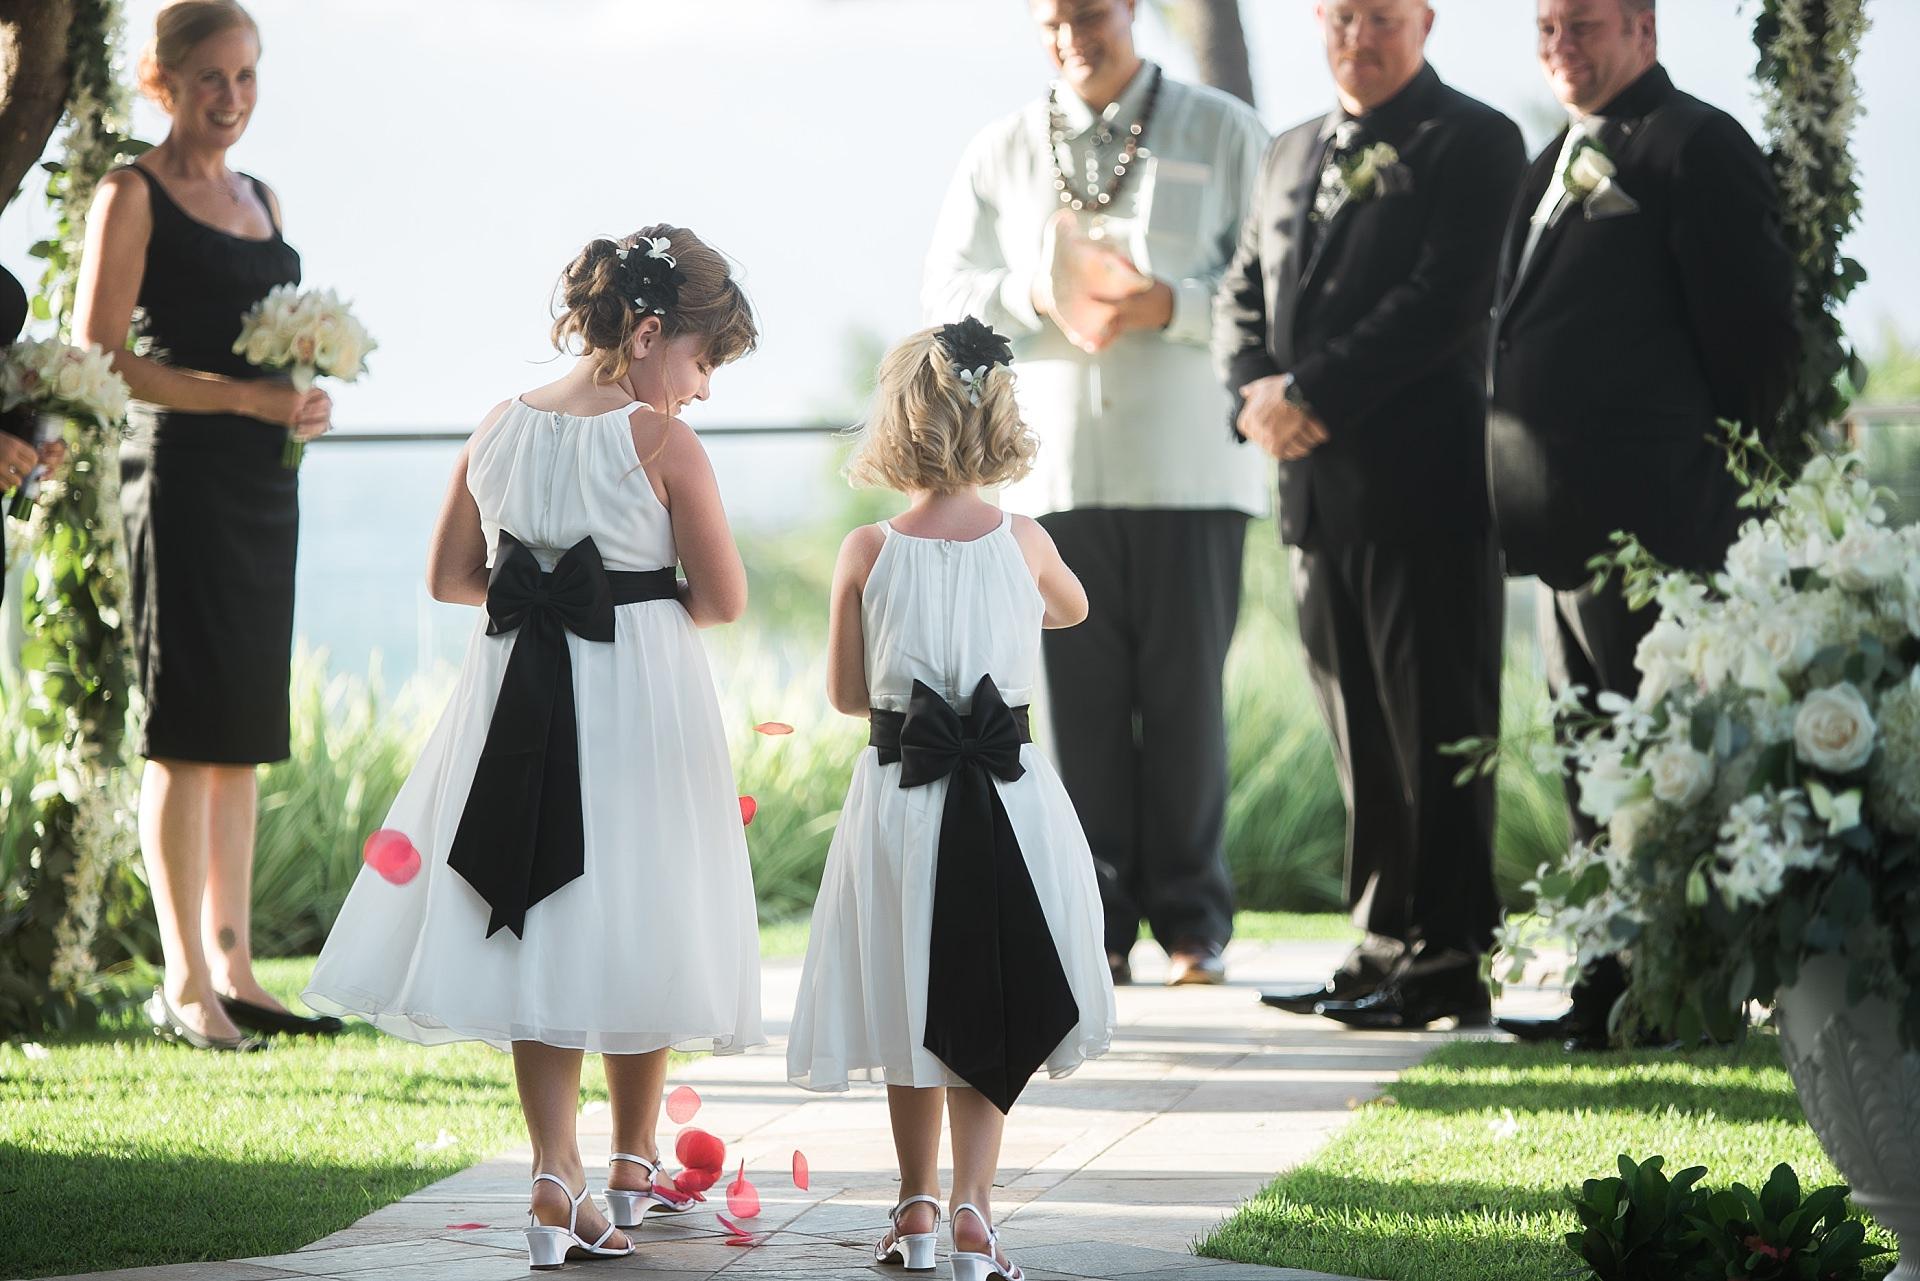 Maui Wedding Four Seasons Resort Girls Walking Down the Aisle